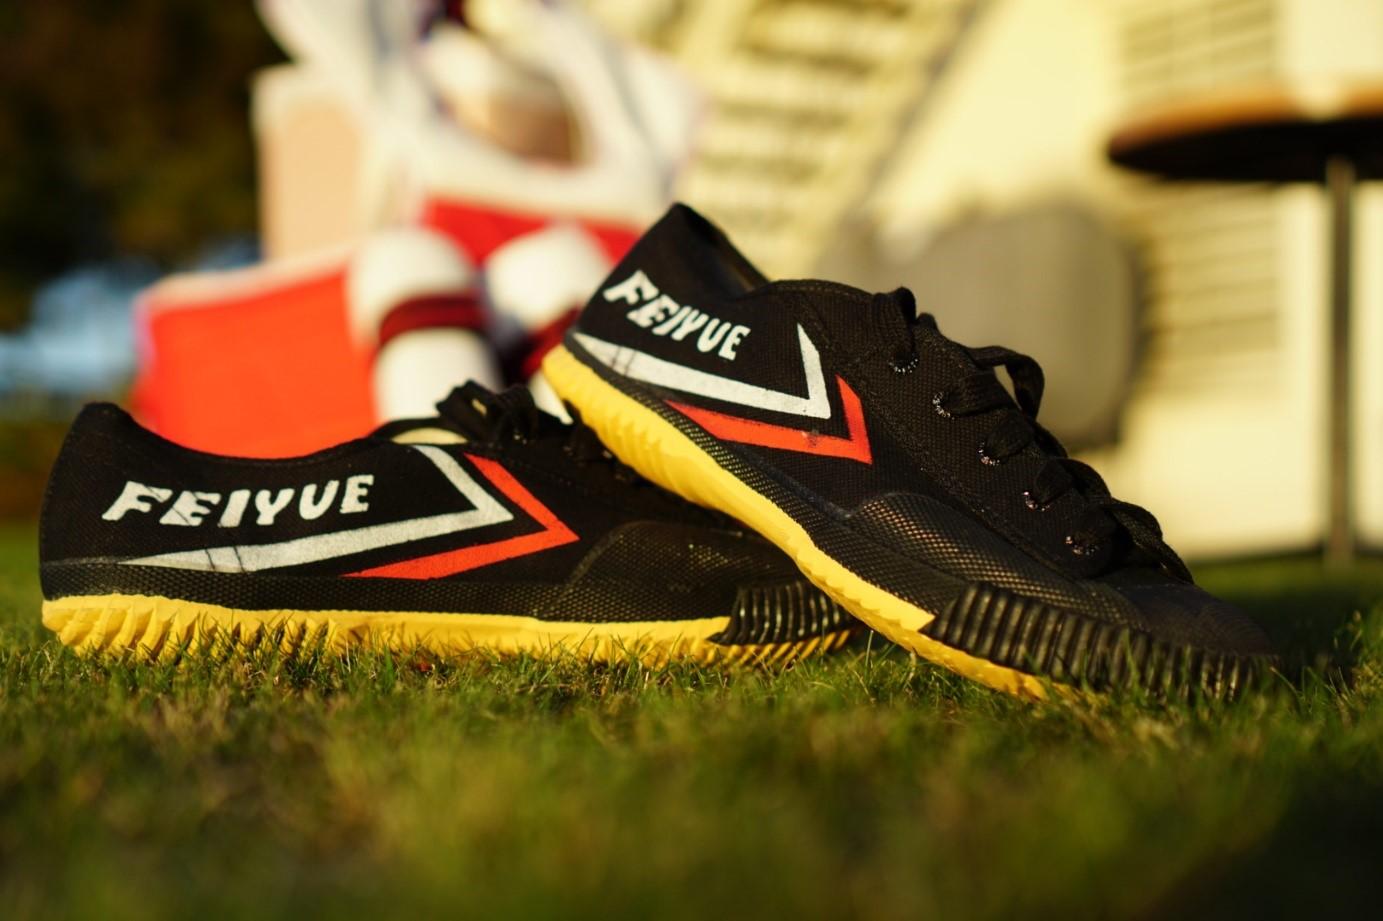 Feiyue Shoes - $60